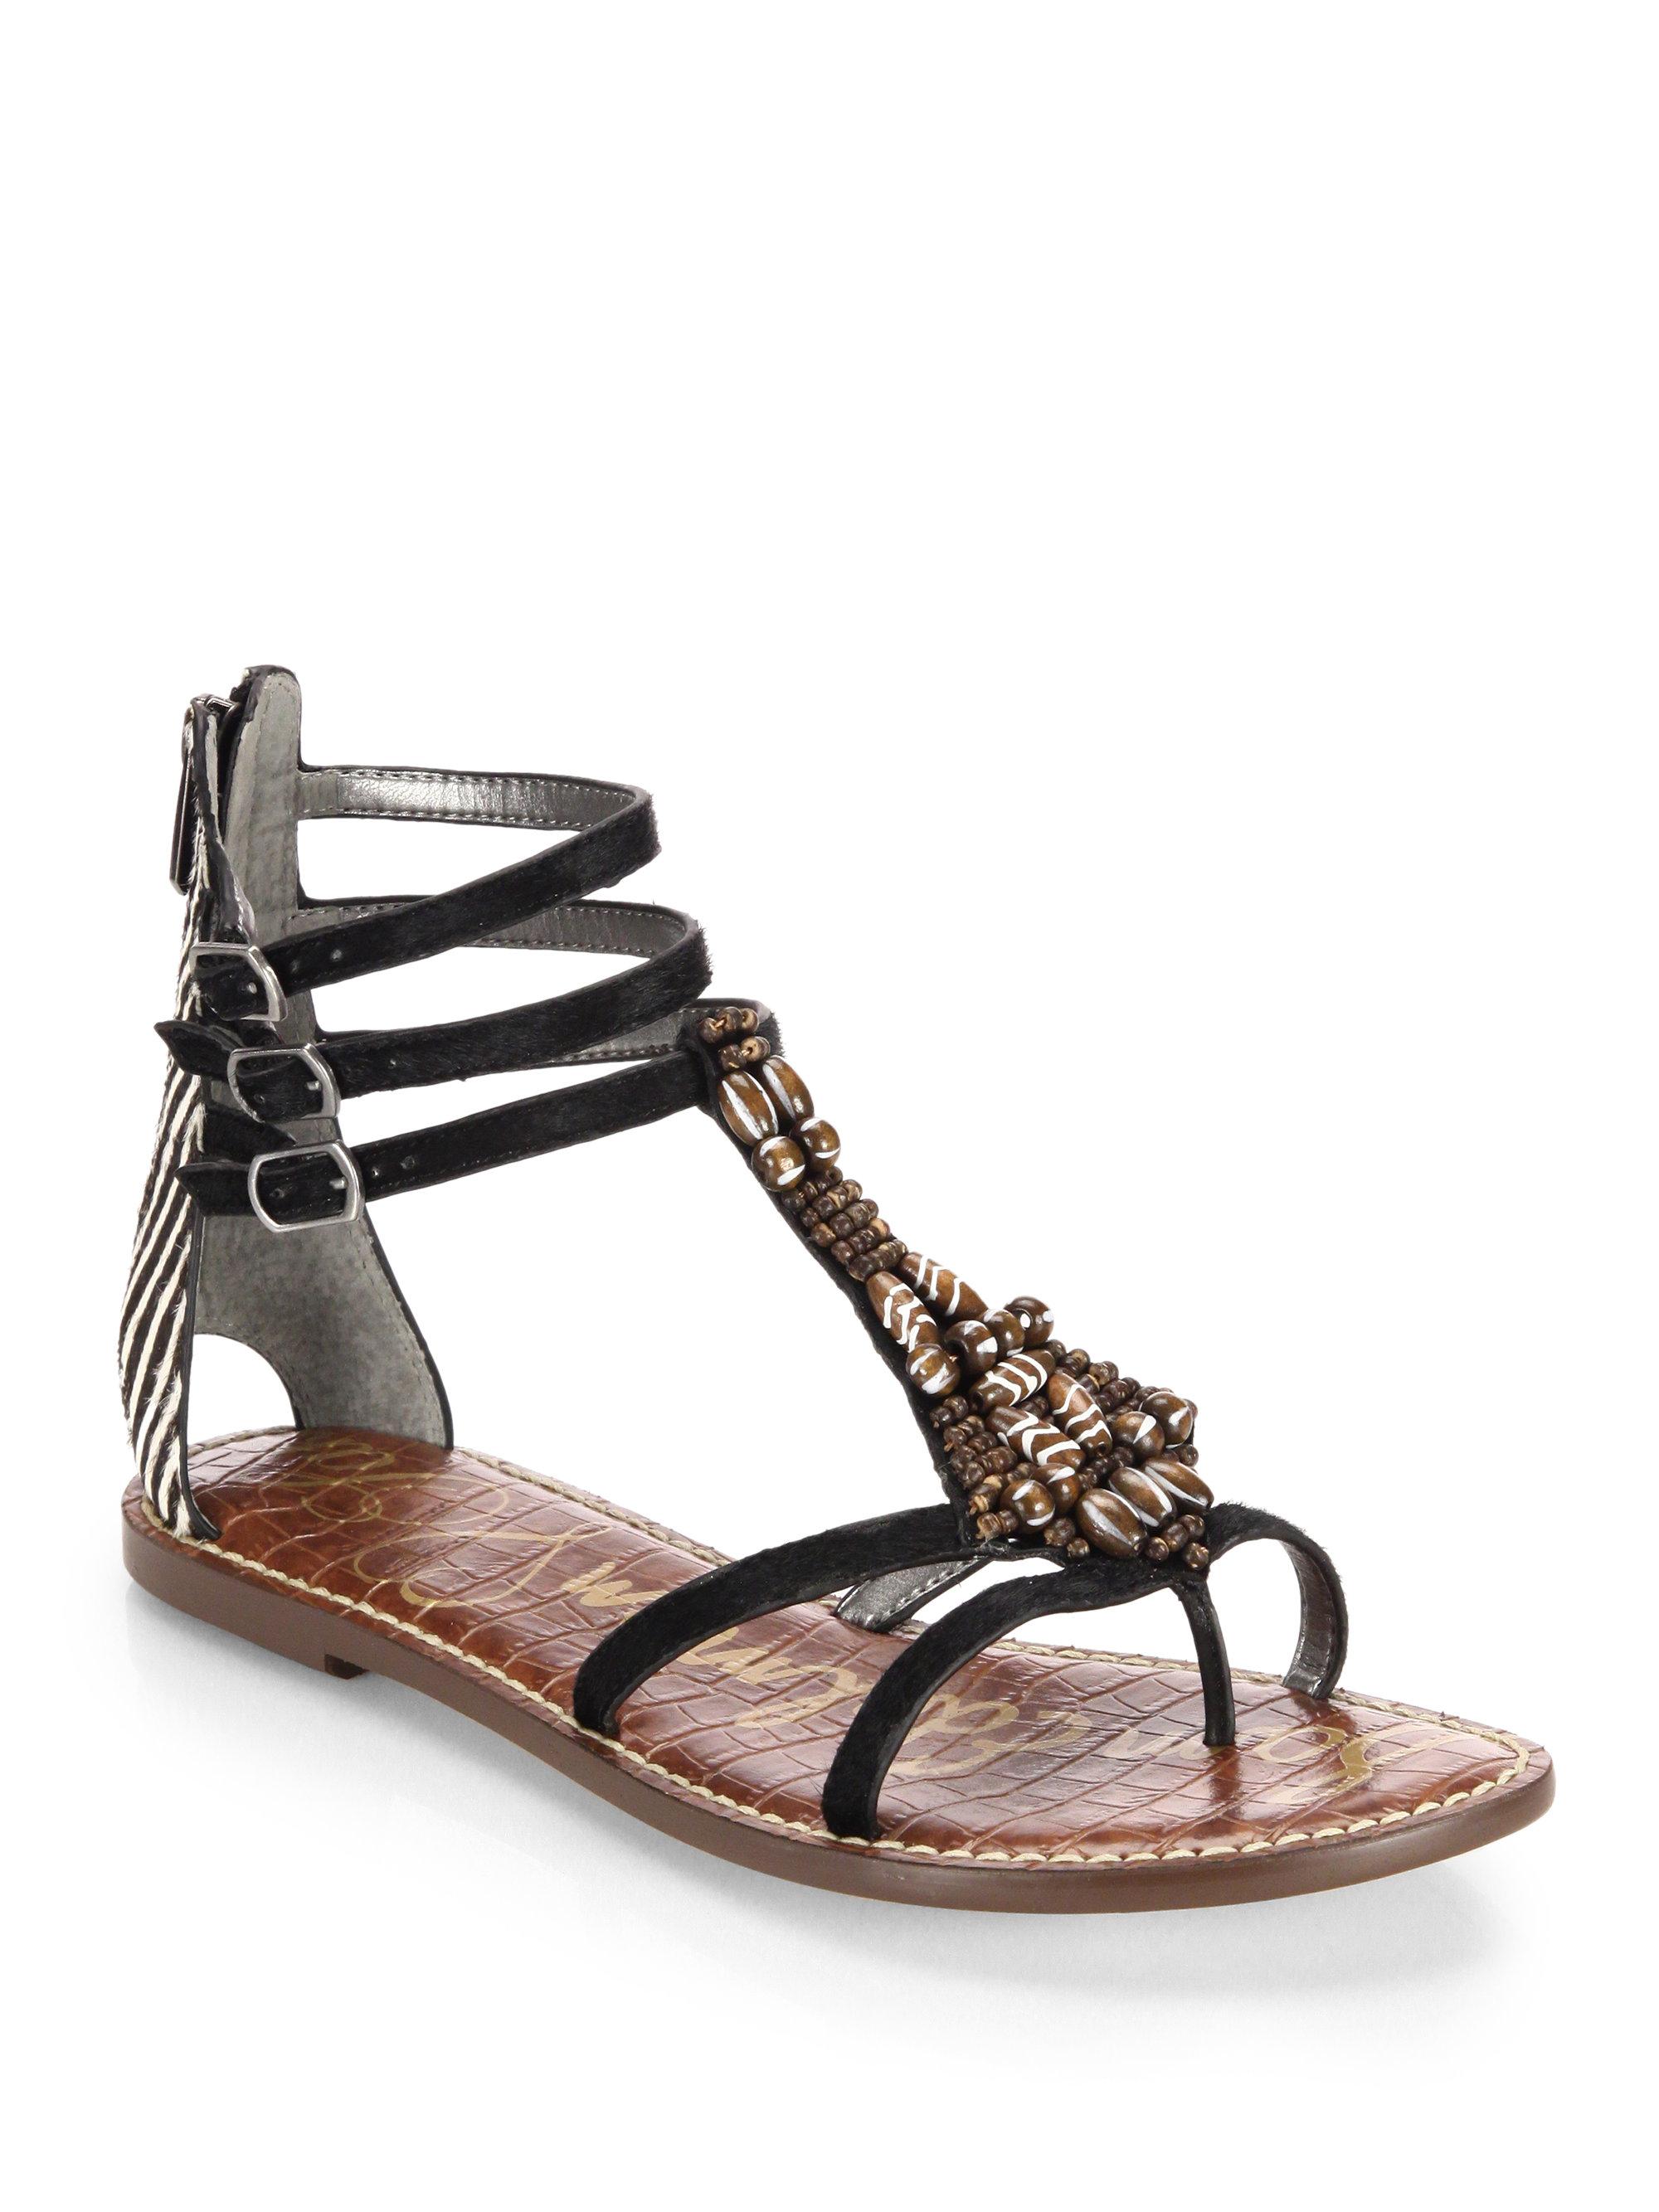 Black Beaded Flat Shoes